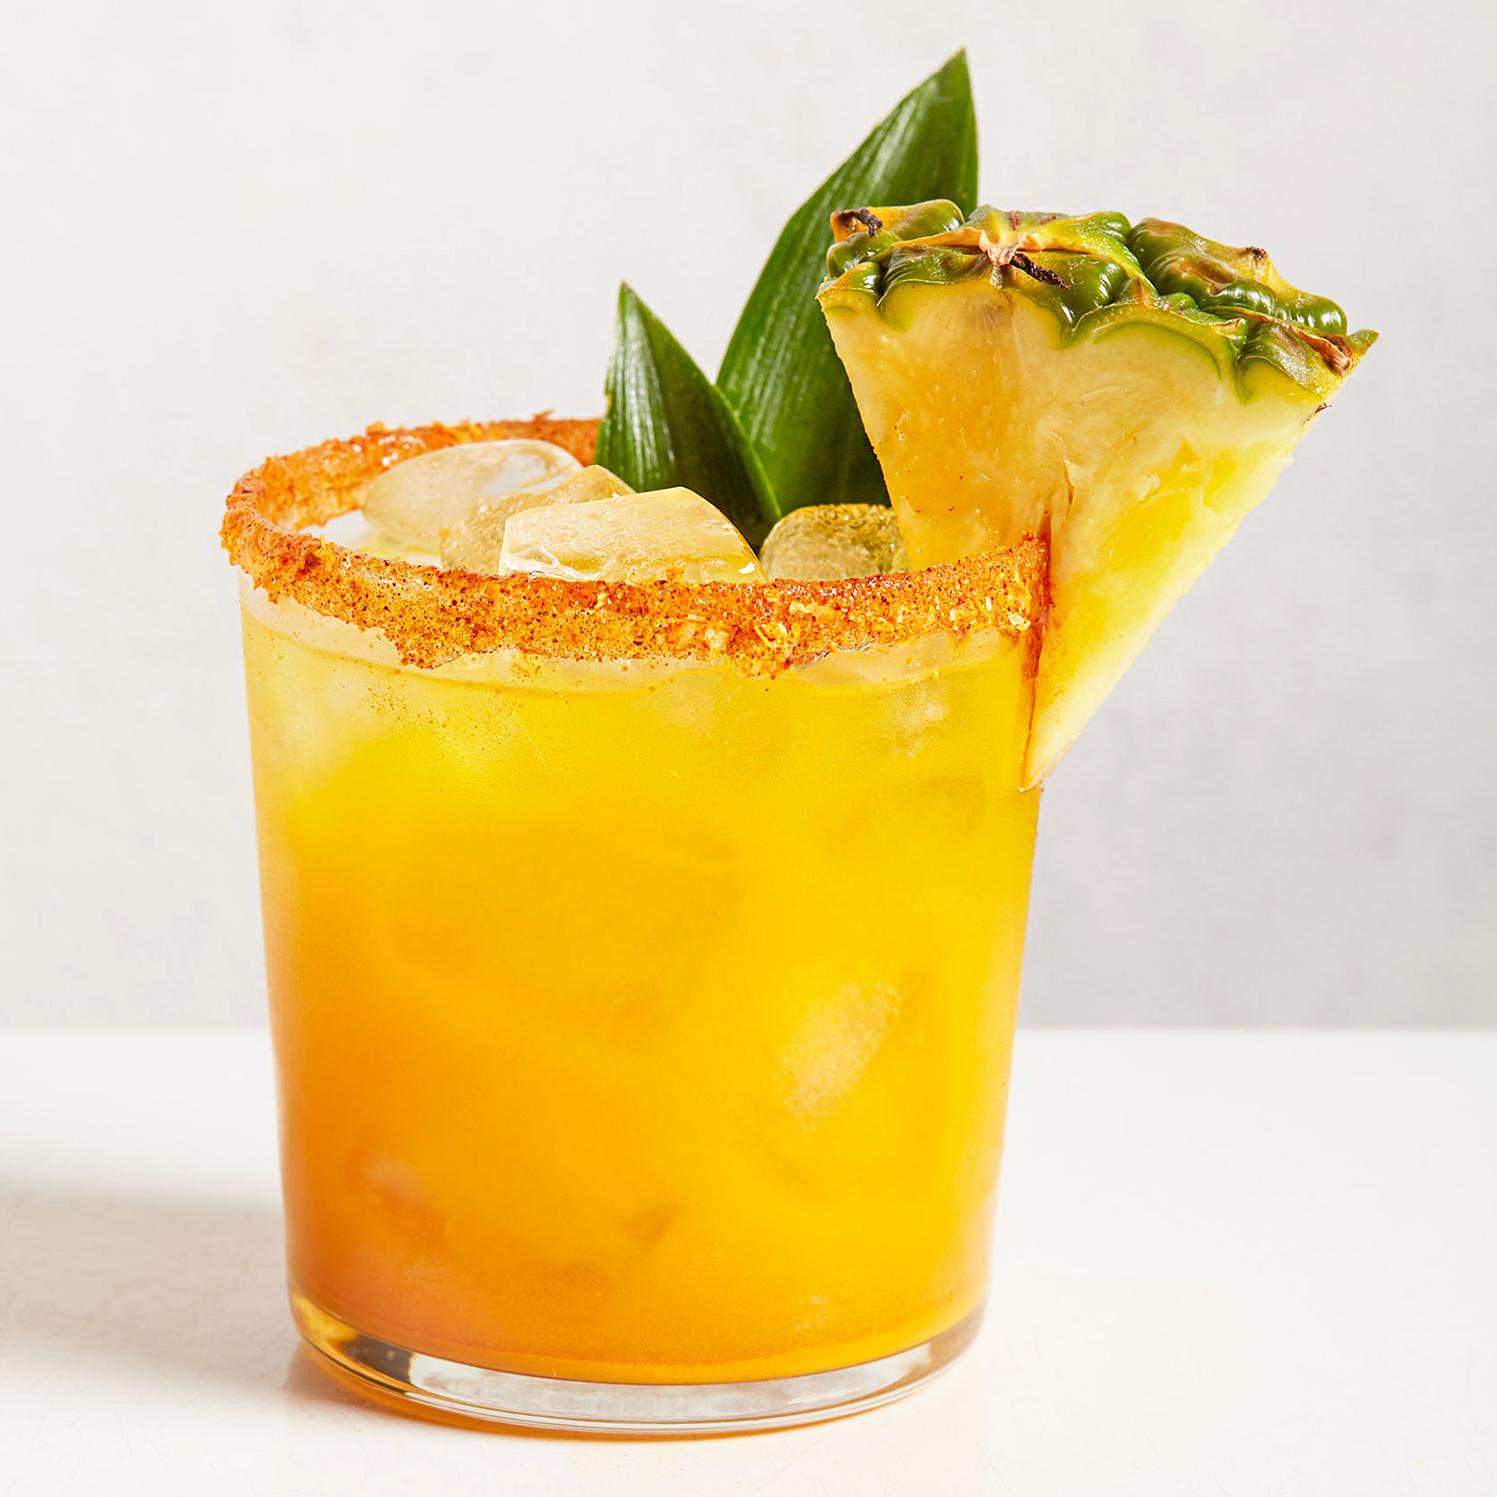 pineapple and turmeric margarita